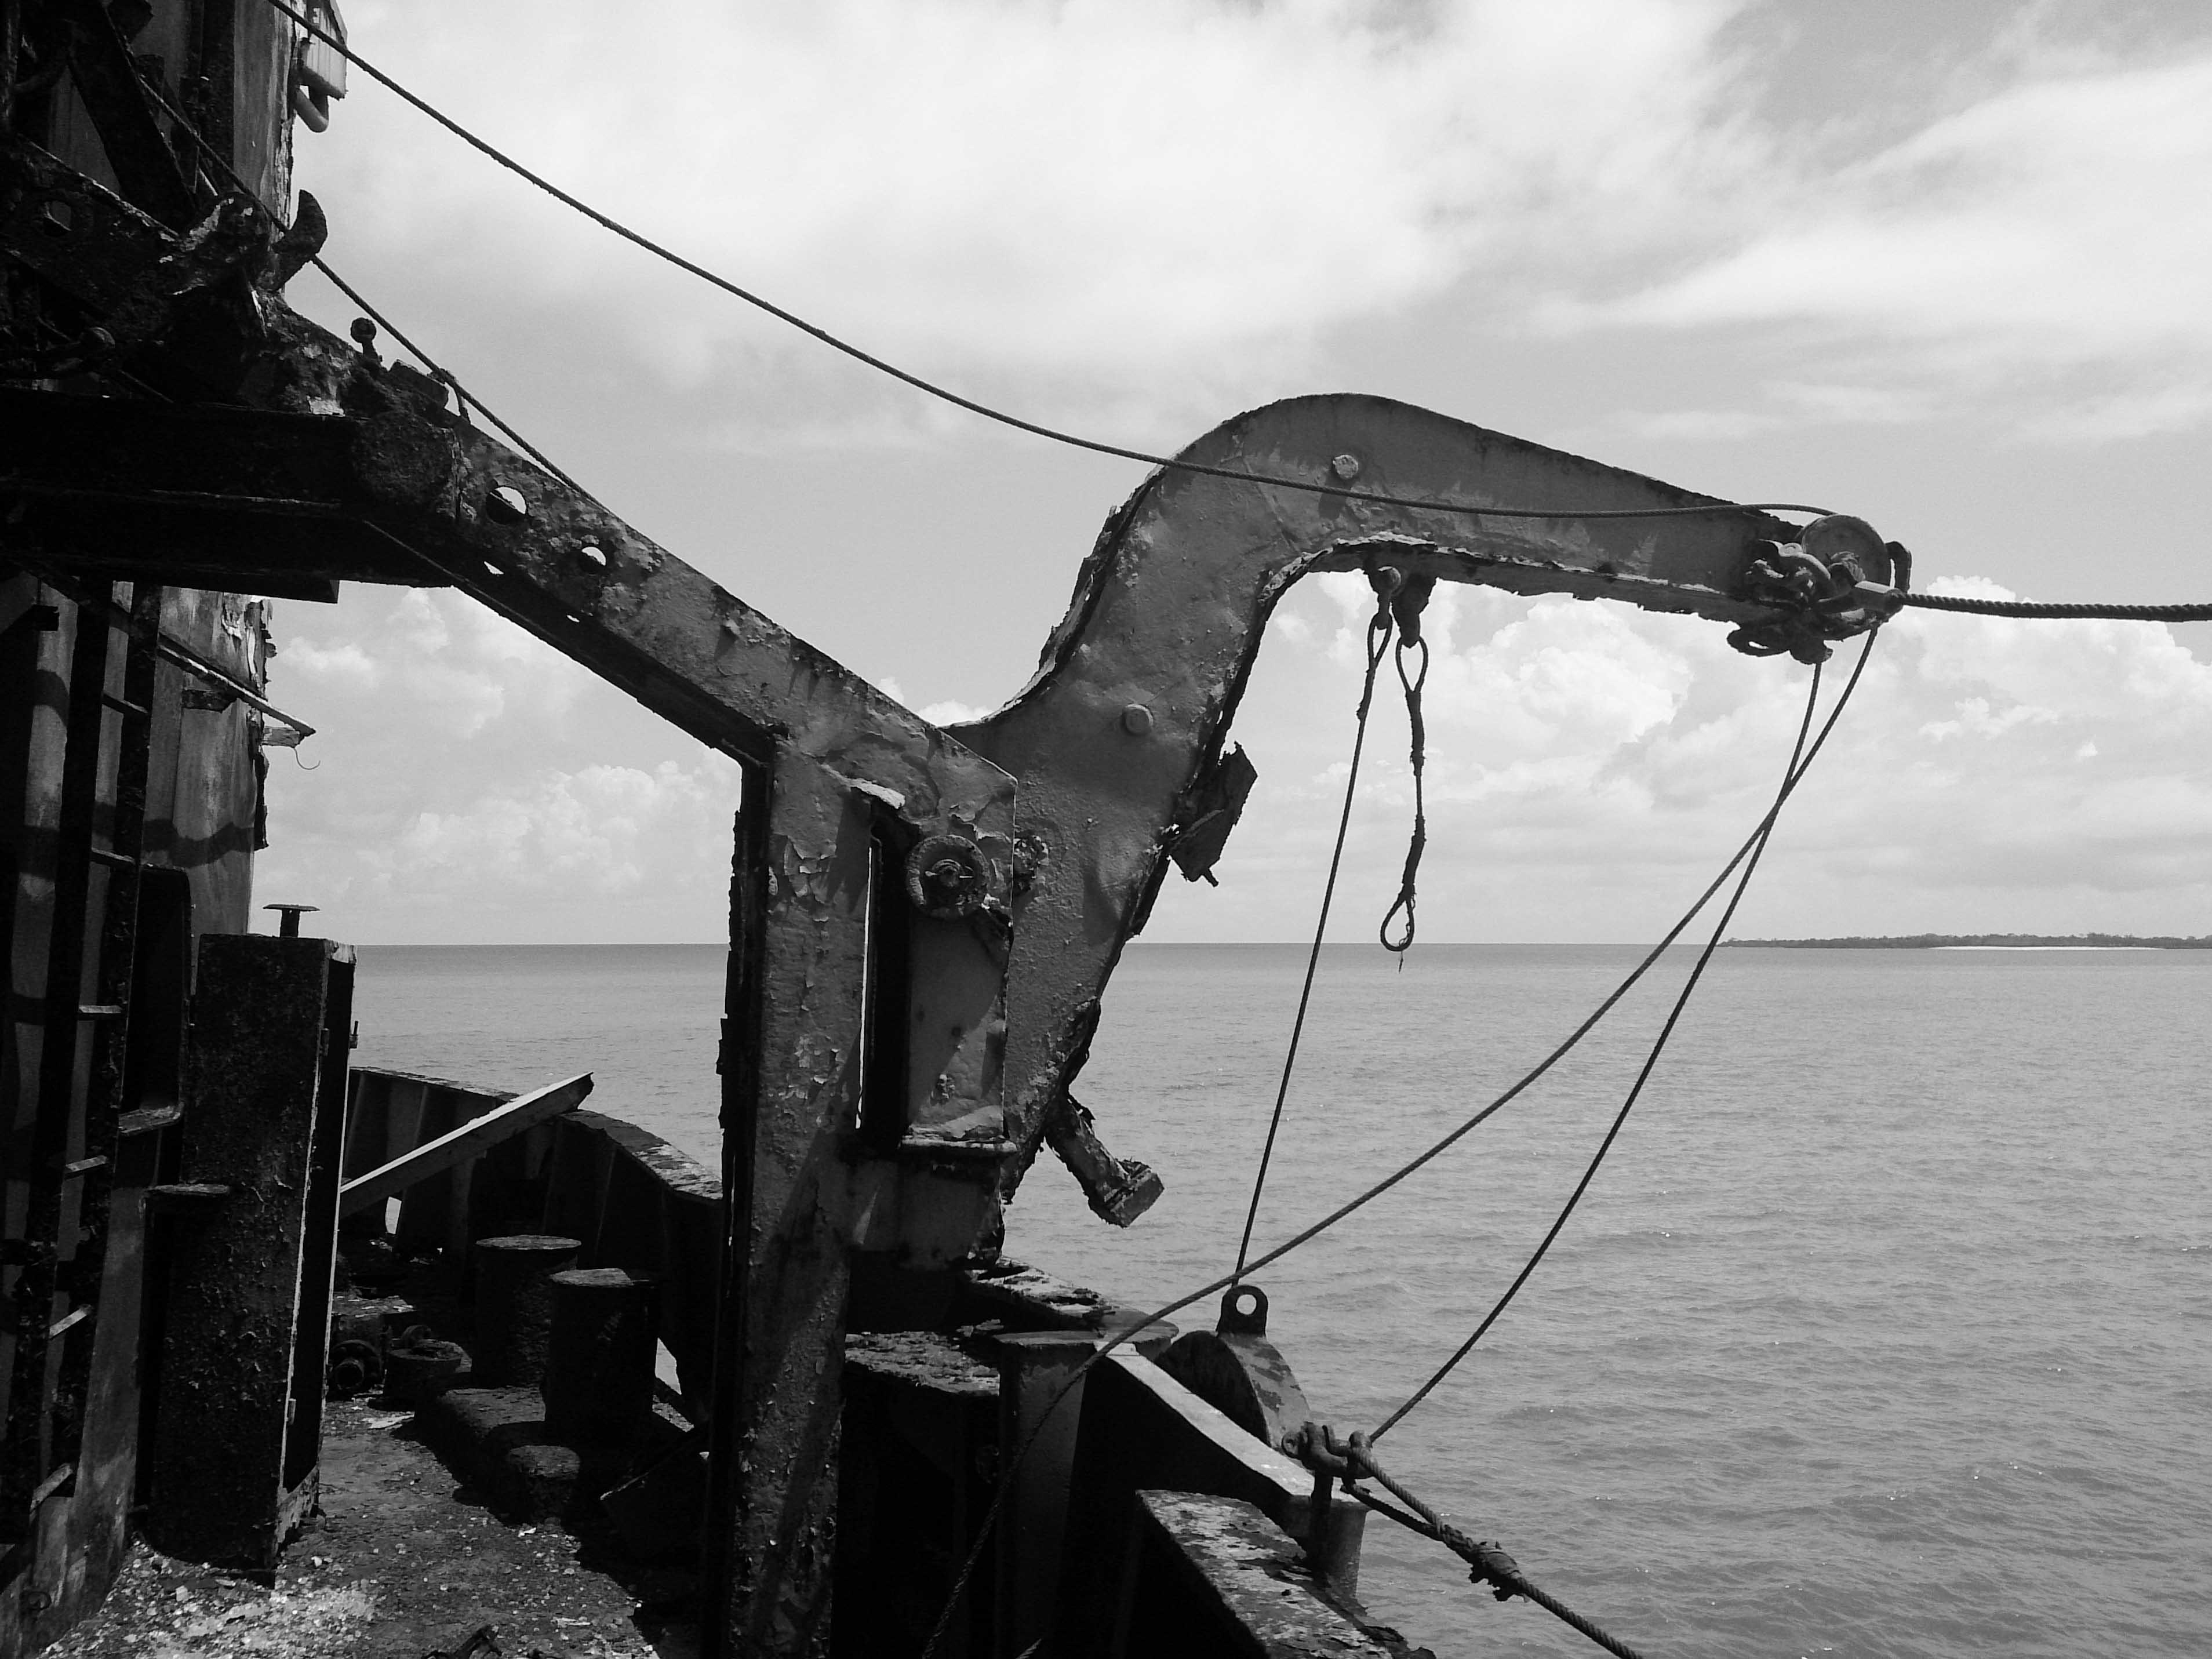 Life boat crane